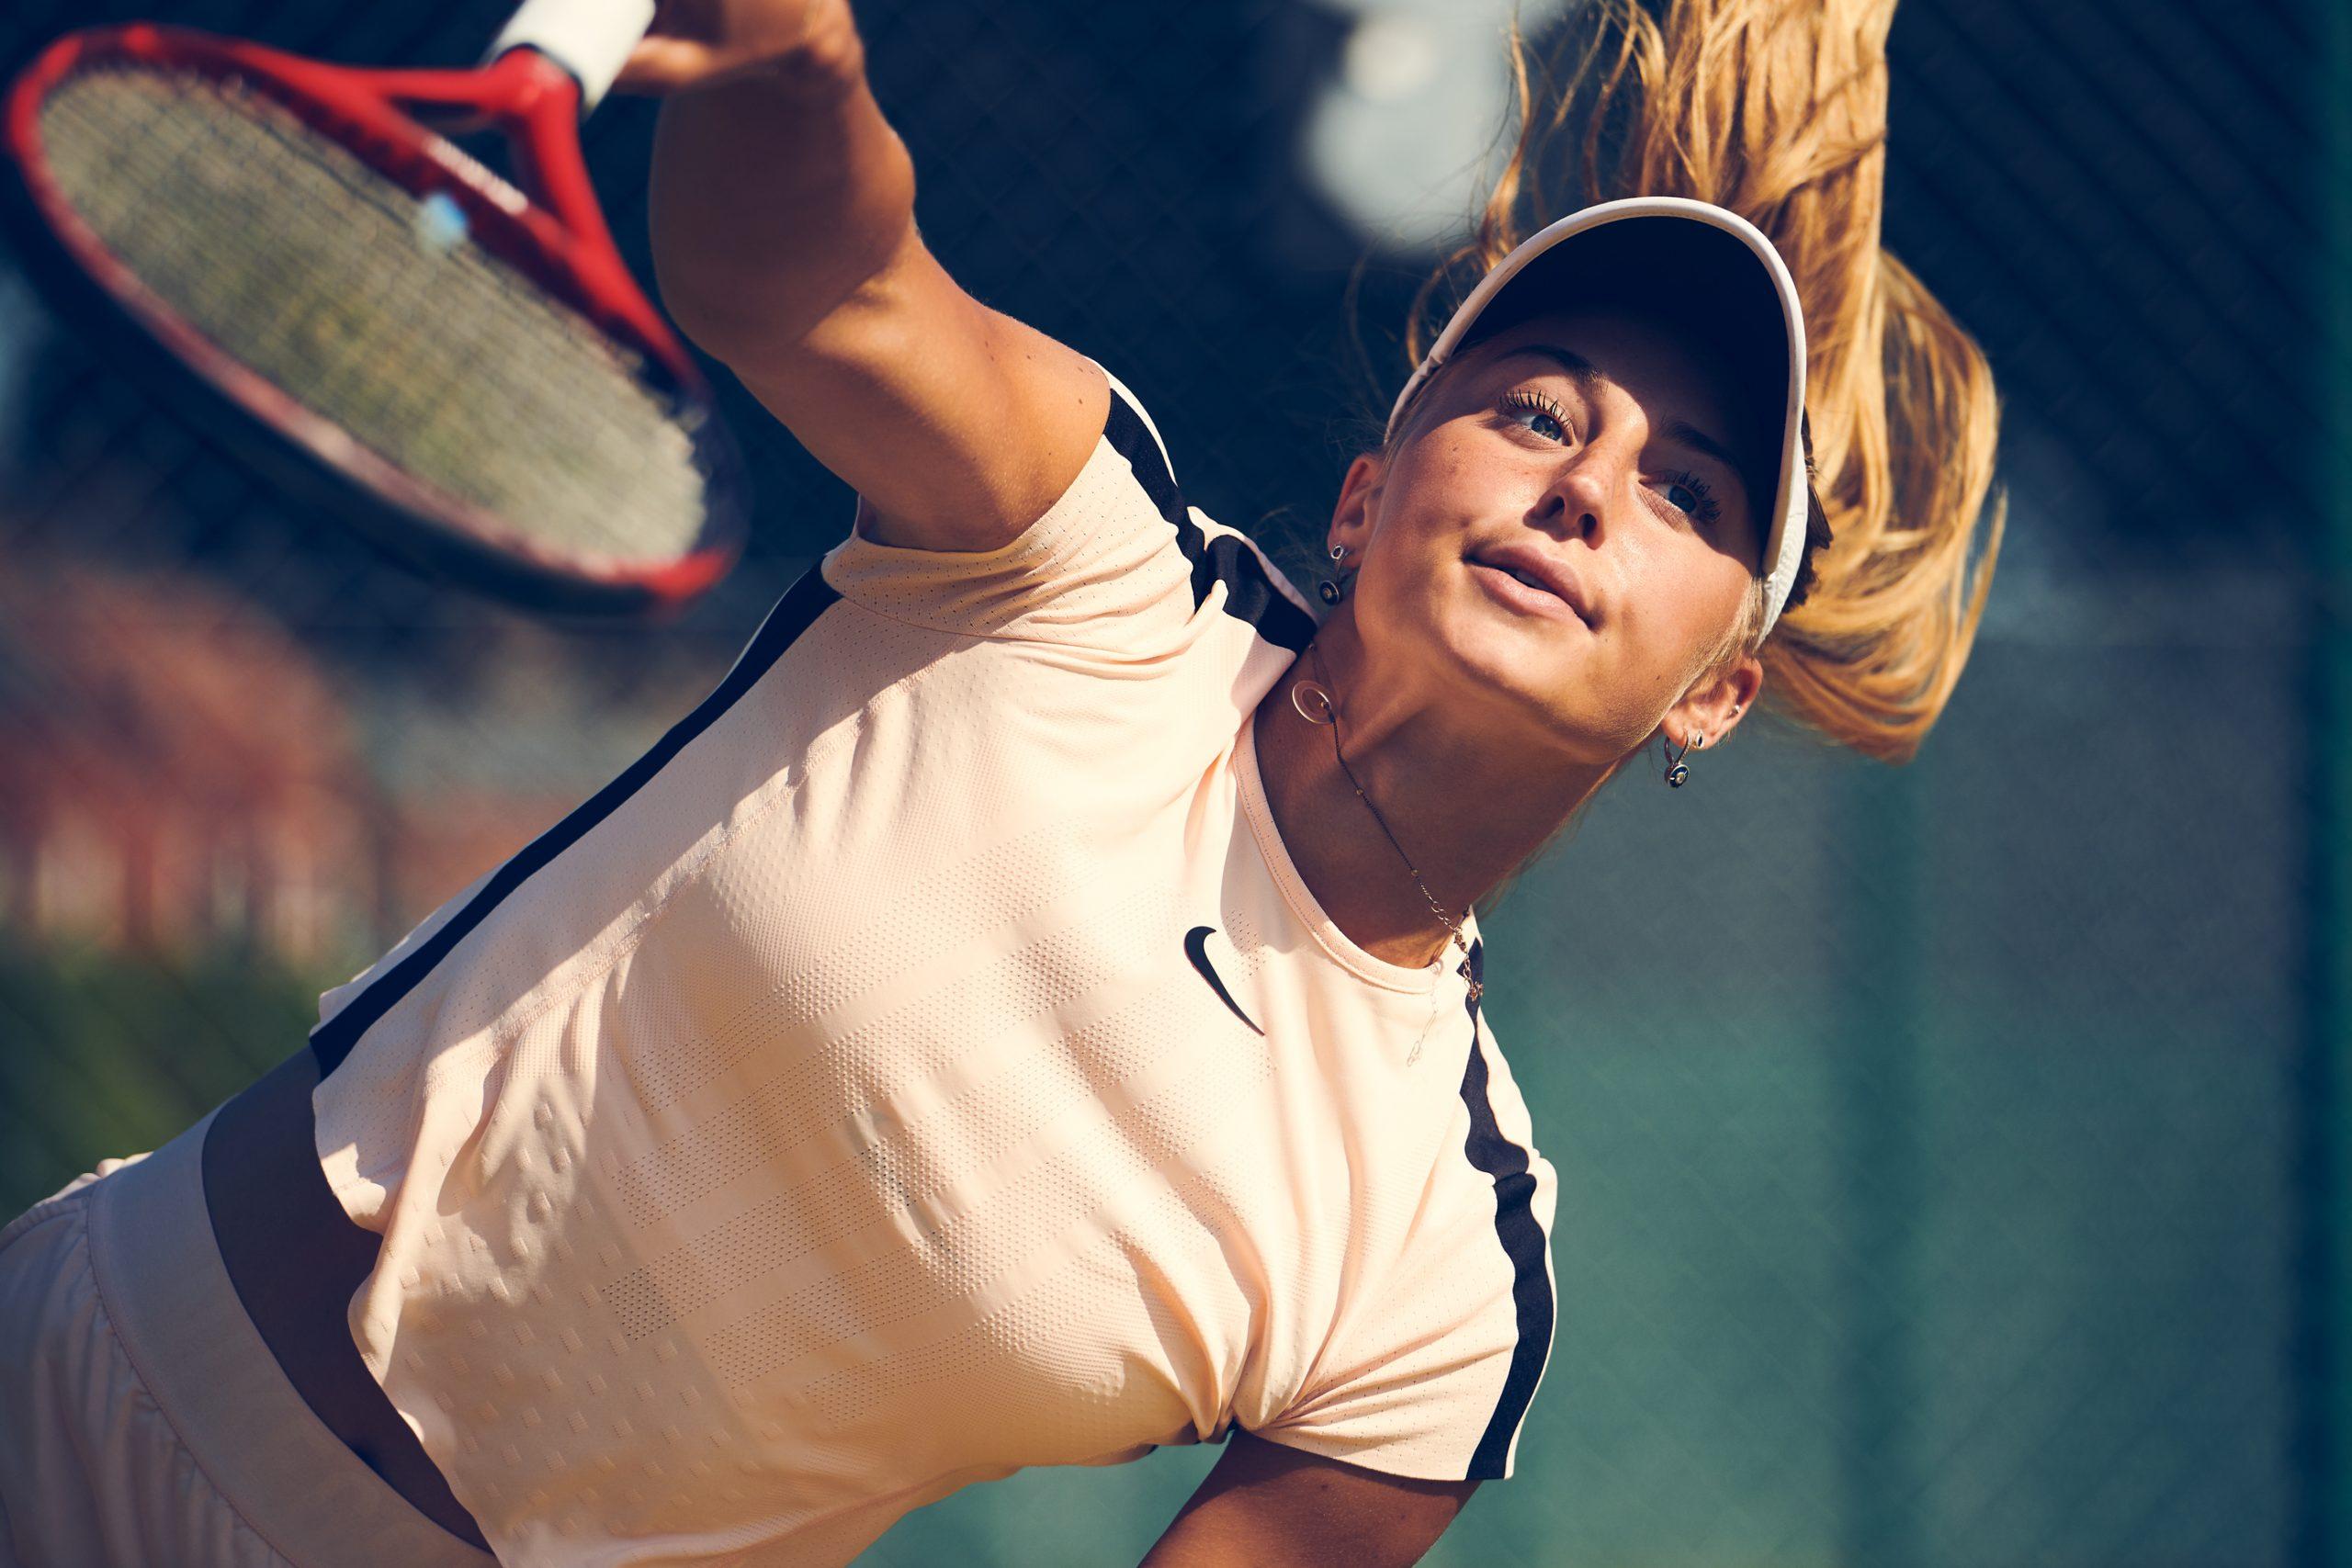 Forte_Olivia_Tennis_0237